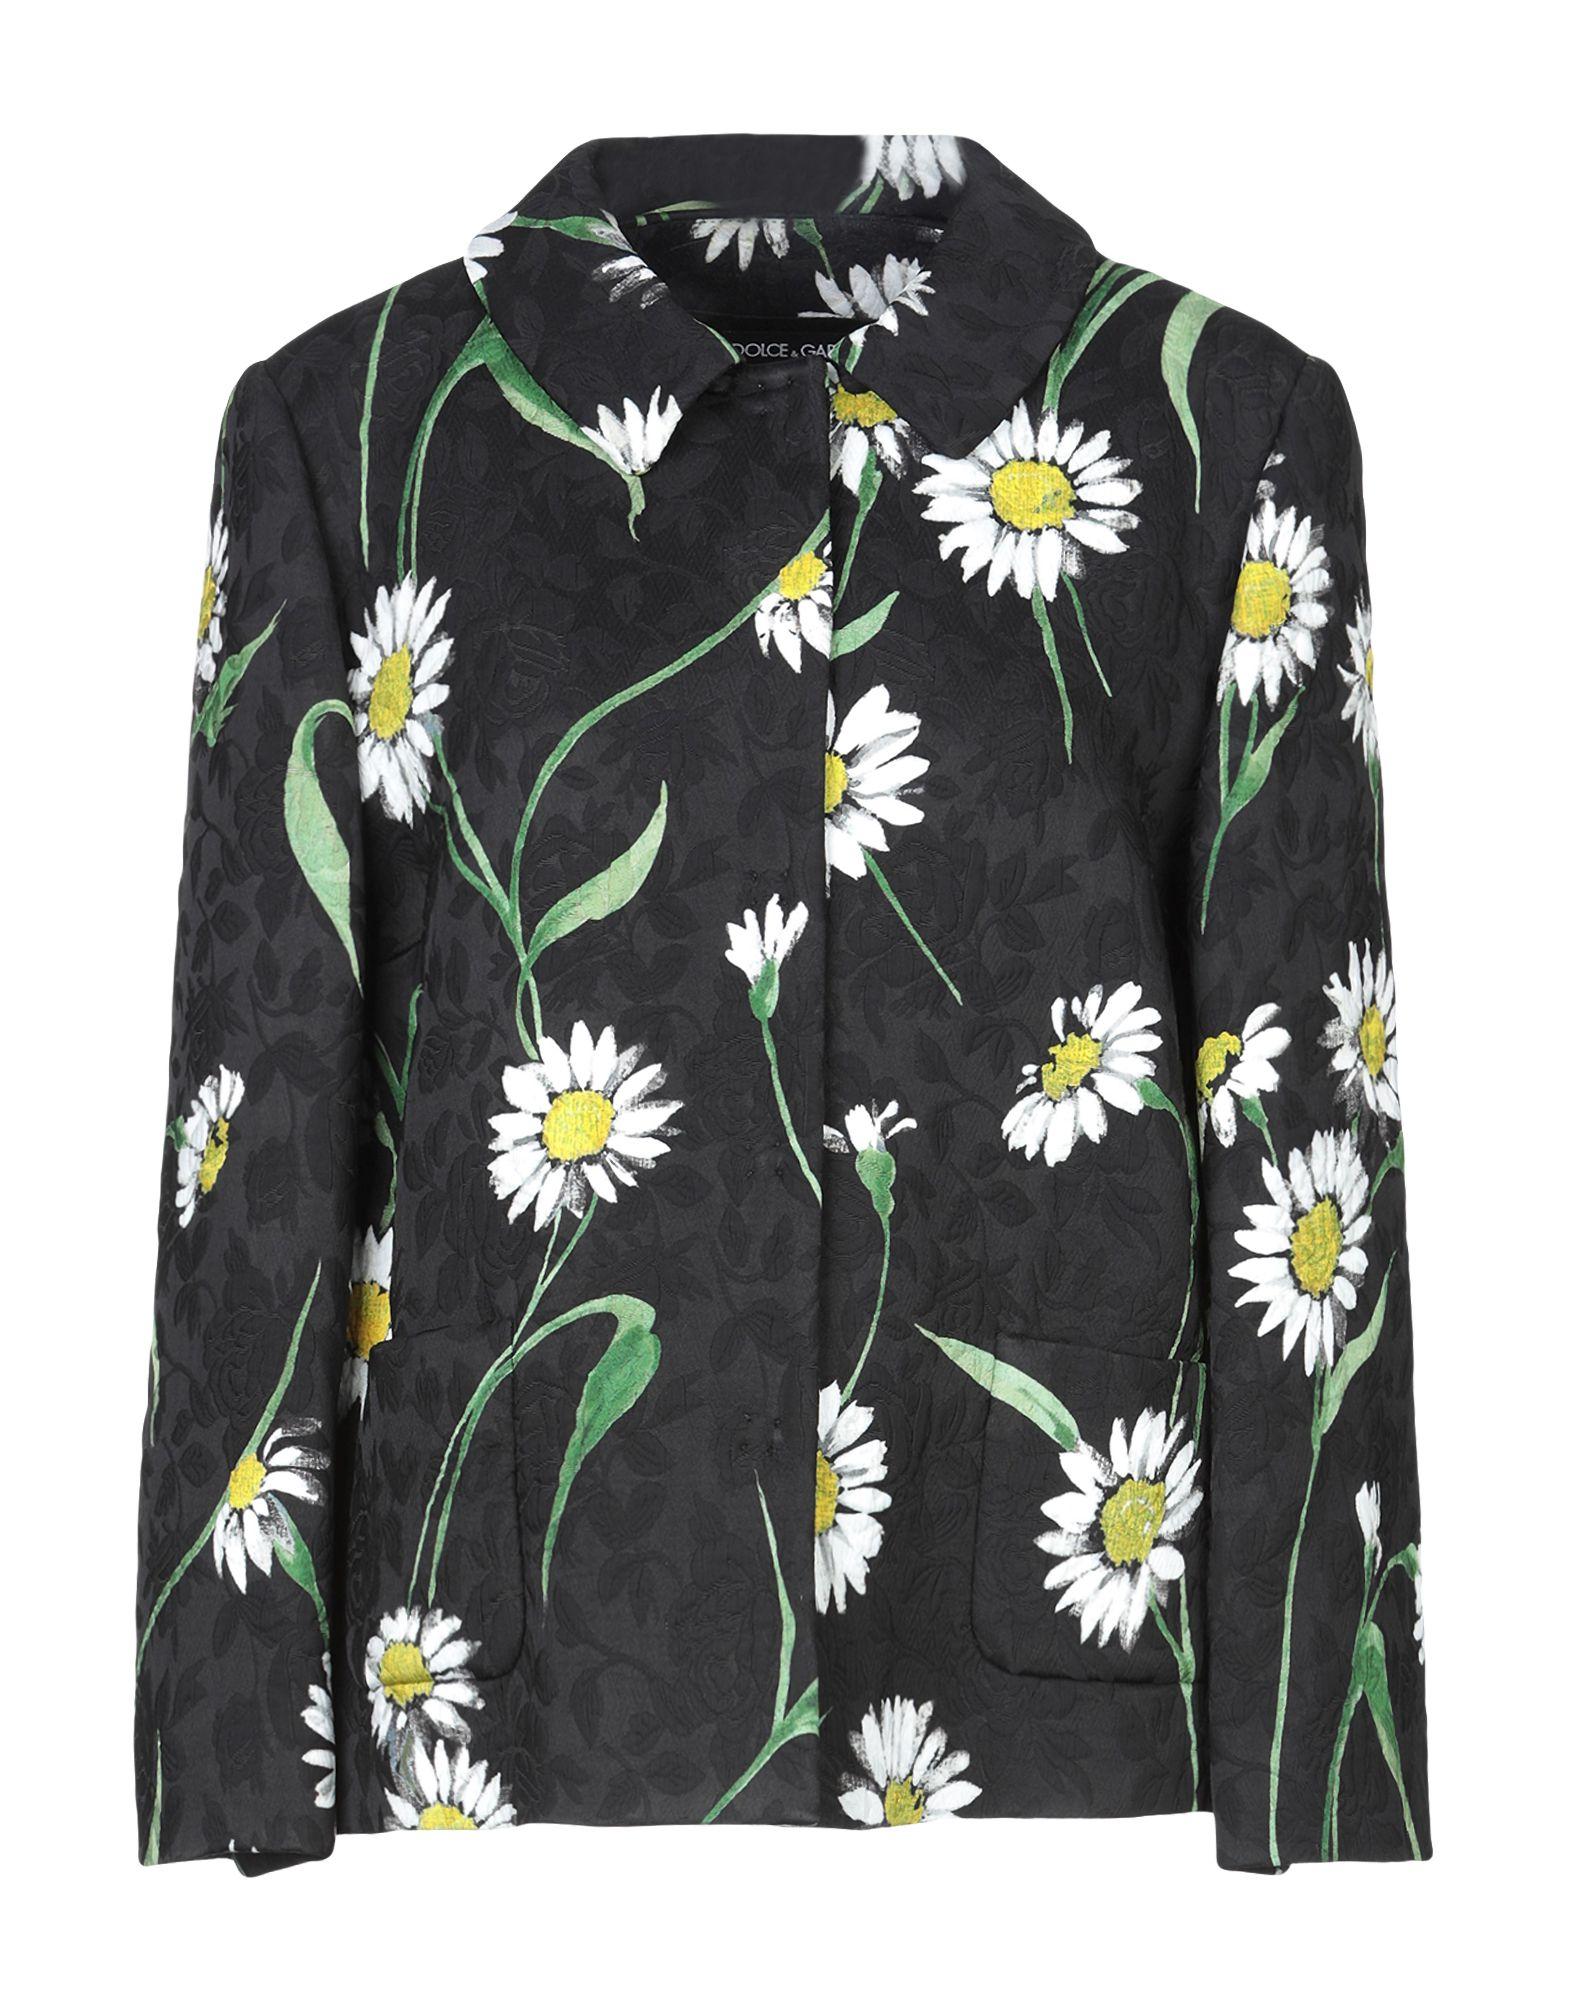 Dolce & Gabbana 'Daisy Print' Jacket